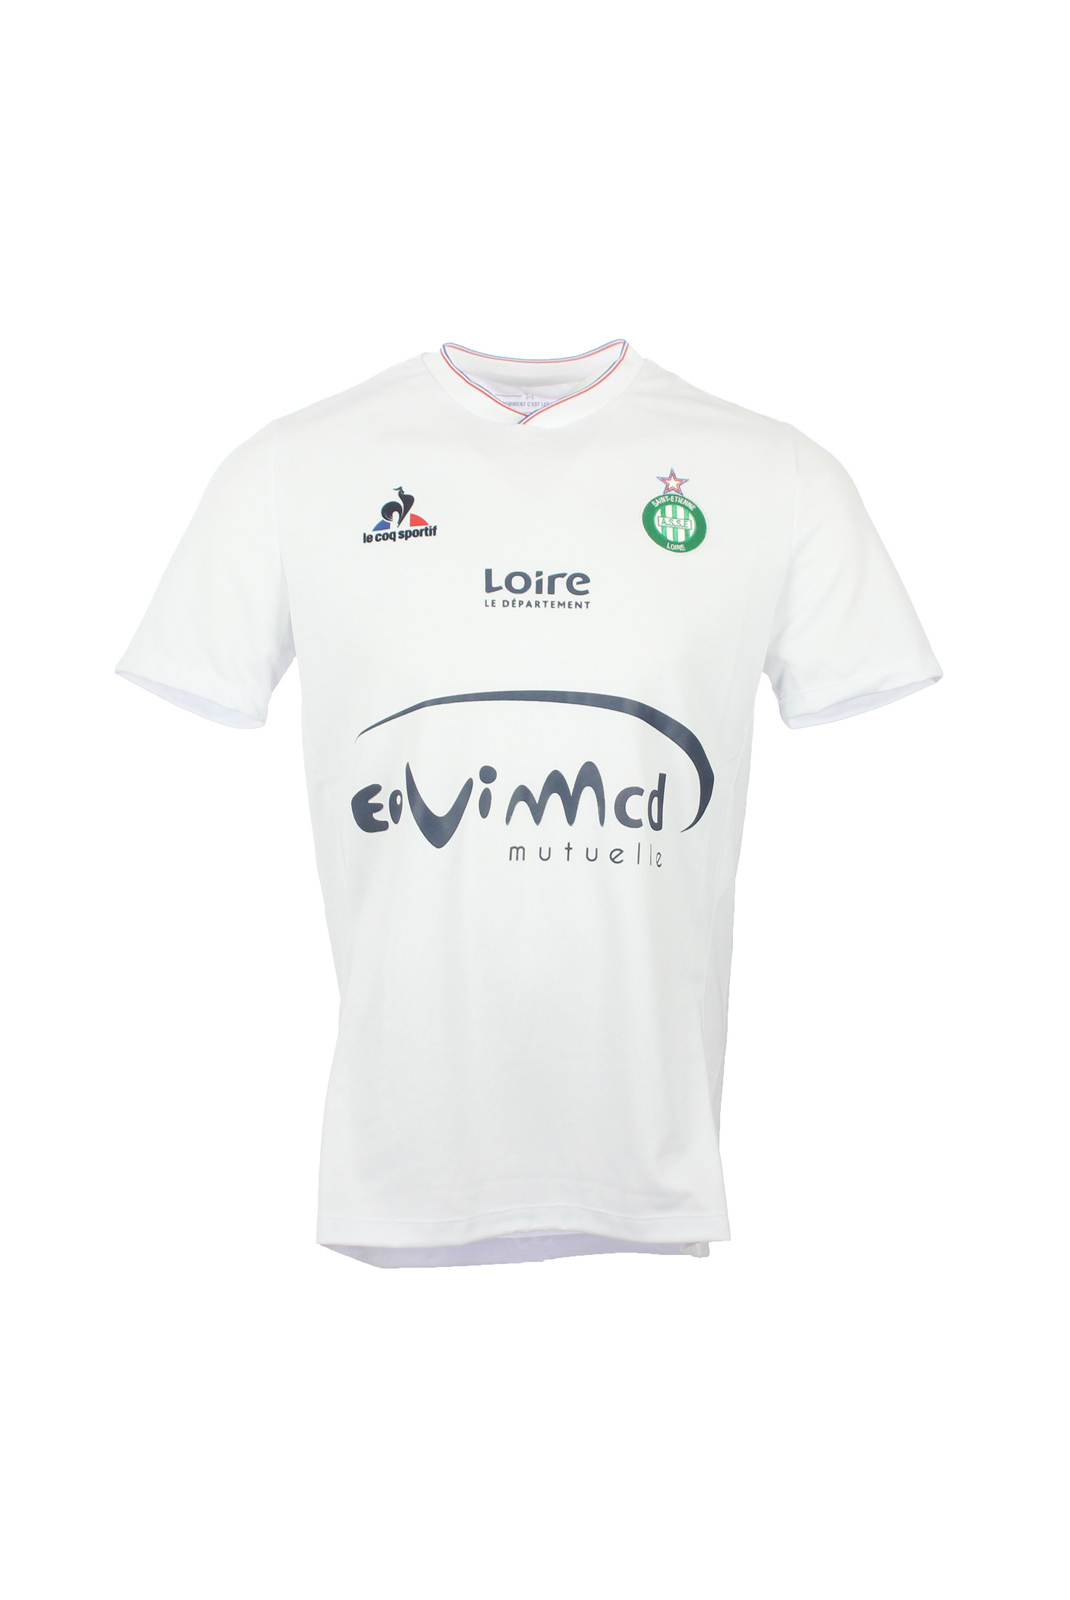 Tee-shirts  Le coq sportif 1520431 ASSE BLANC